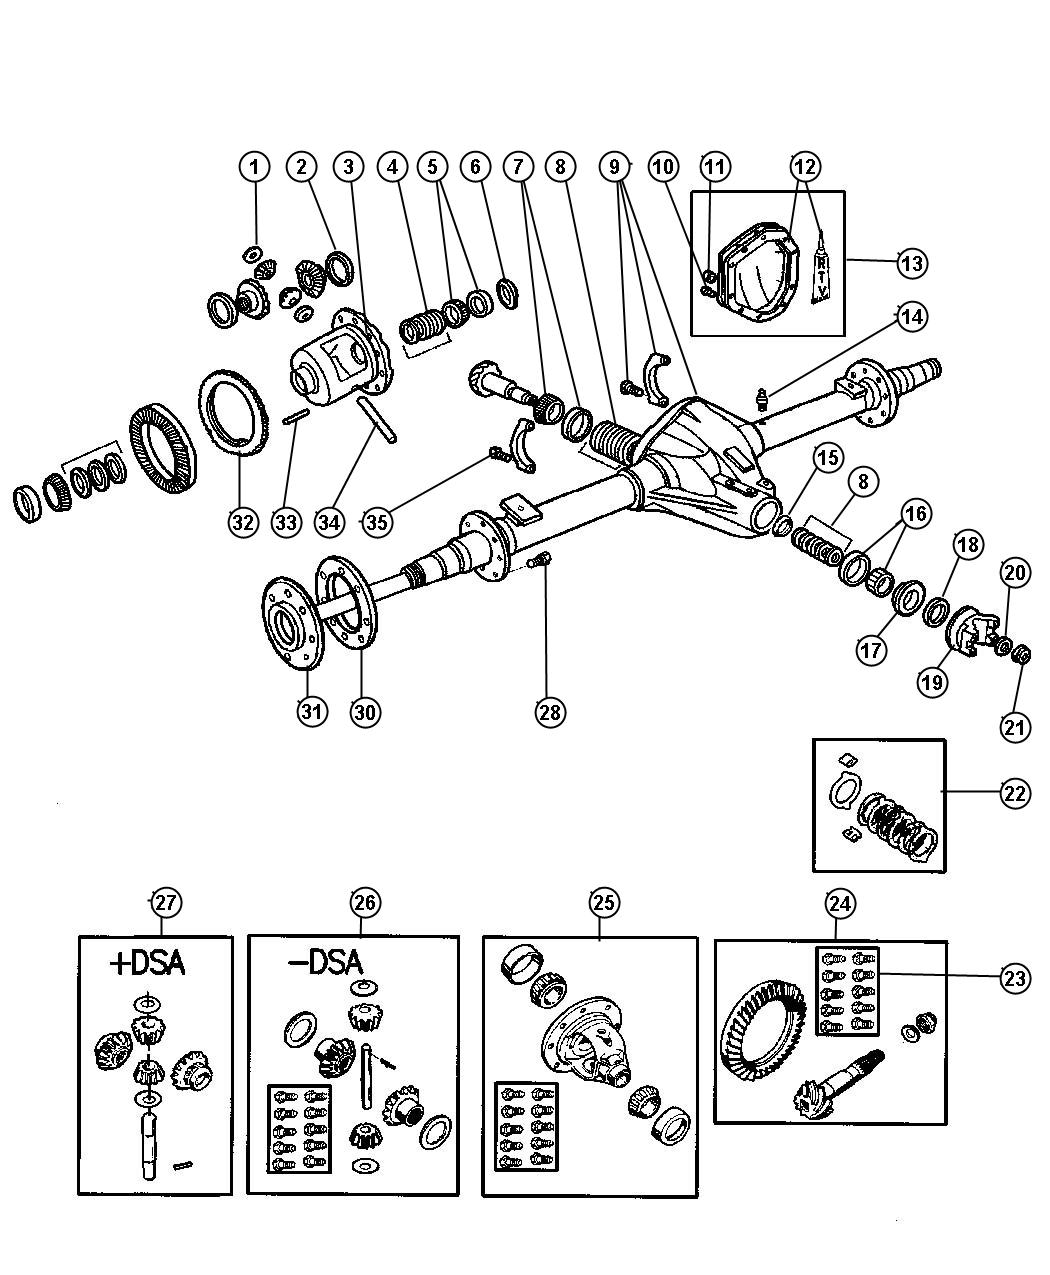 Dana 70 Rear Axle Diagram, Dana, Free Engine Image For